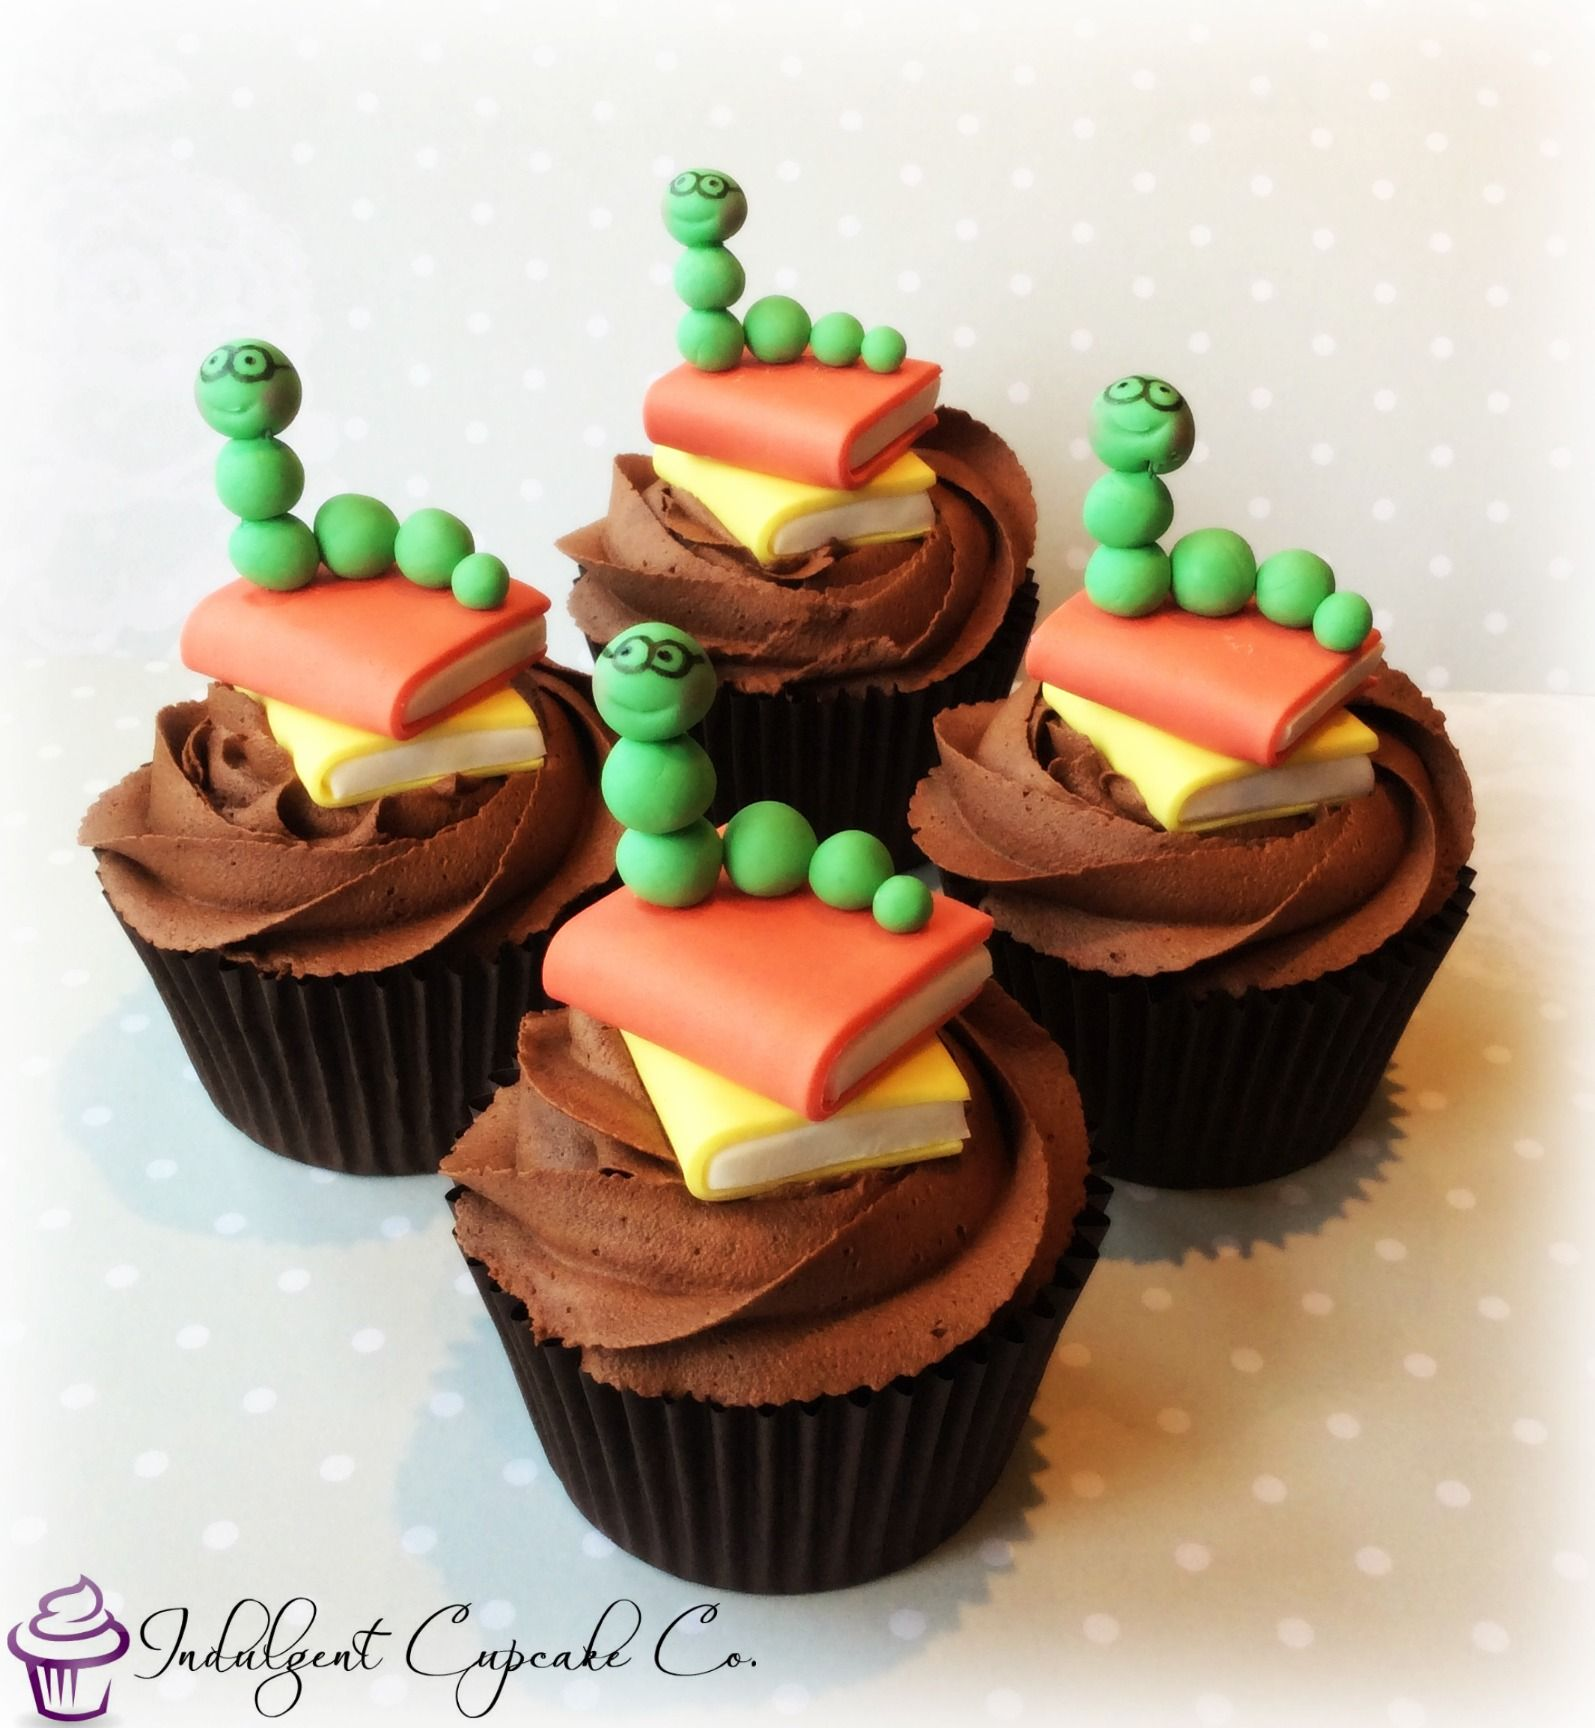 Cute Bookworm Cupcakes Cake Decorating Pig Cake Baking